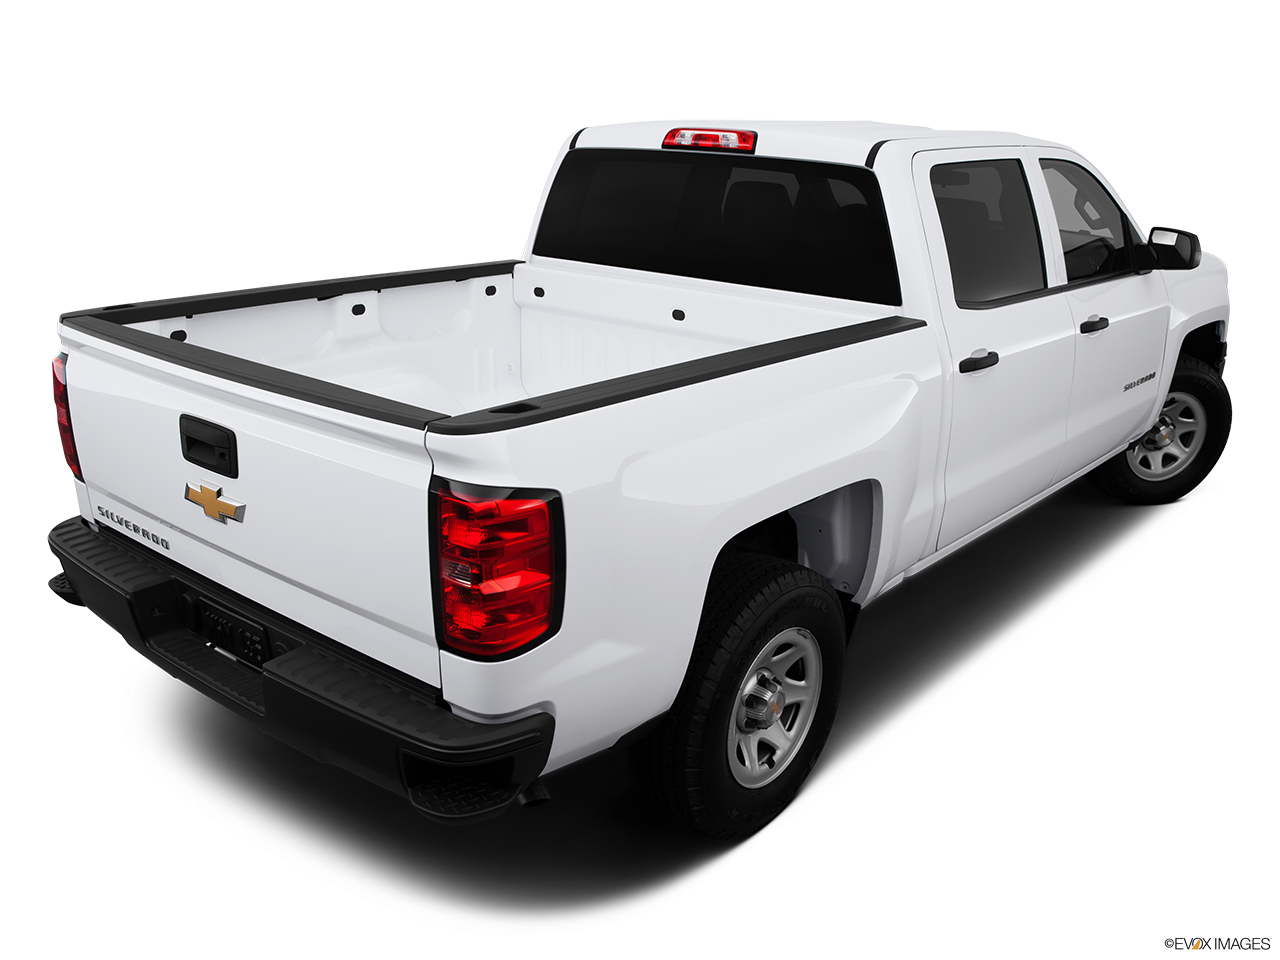 2014 chevy silverado 1500 rear diff oil autos post. Black Bedroom Furniture Sets. Home Design Ideas